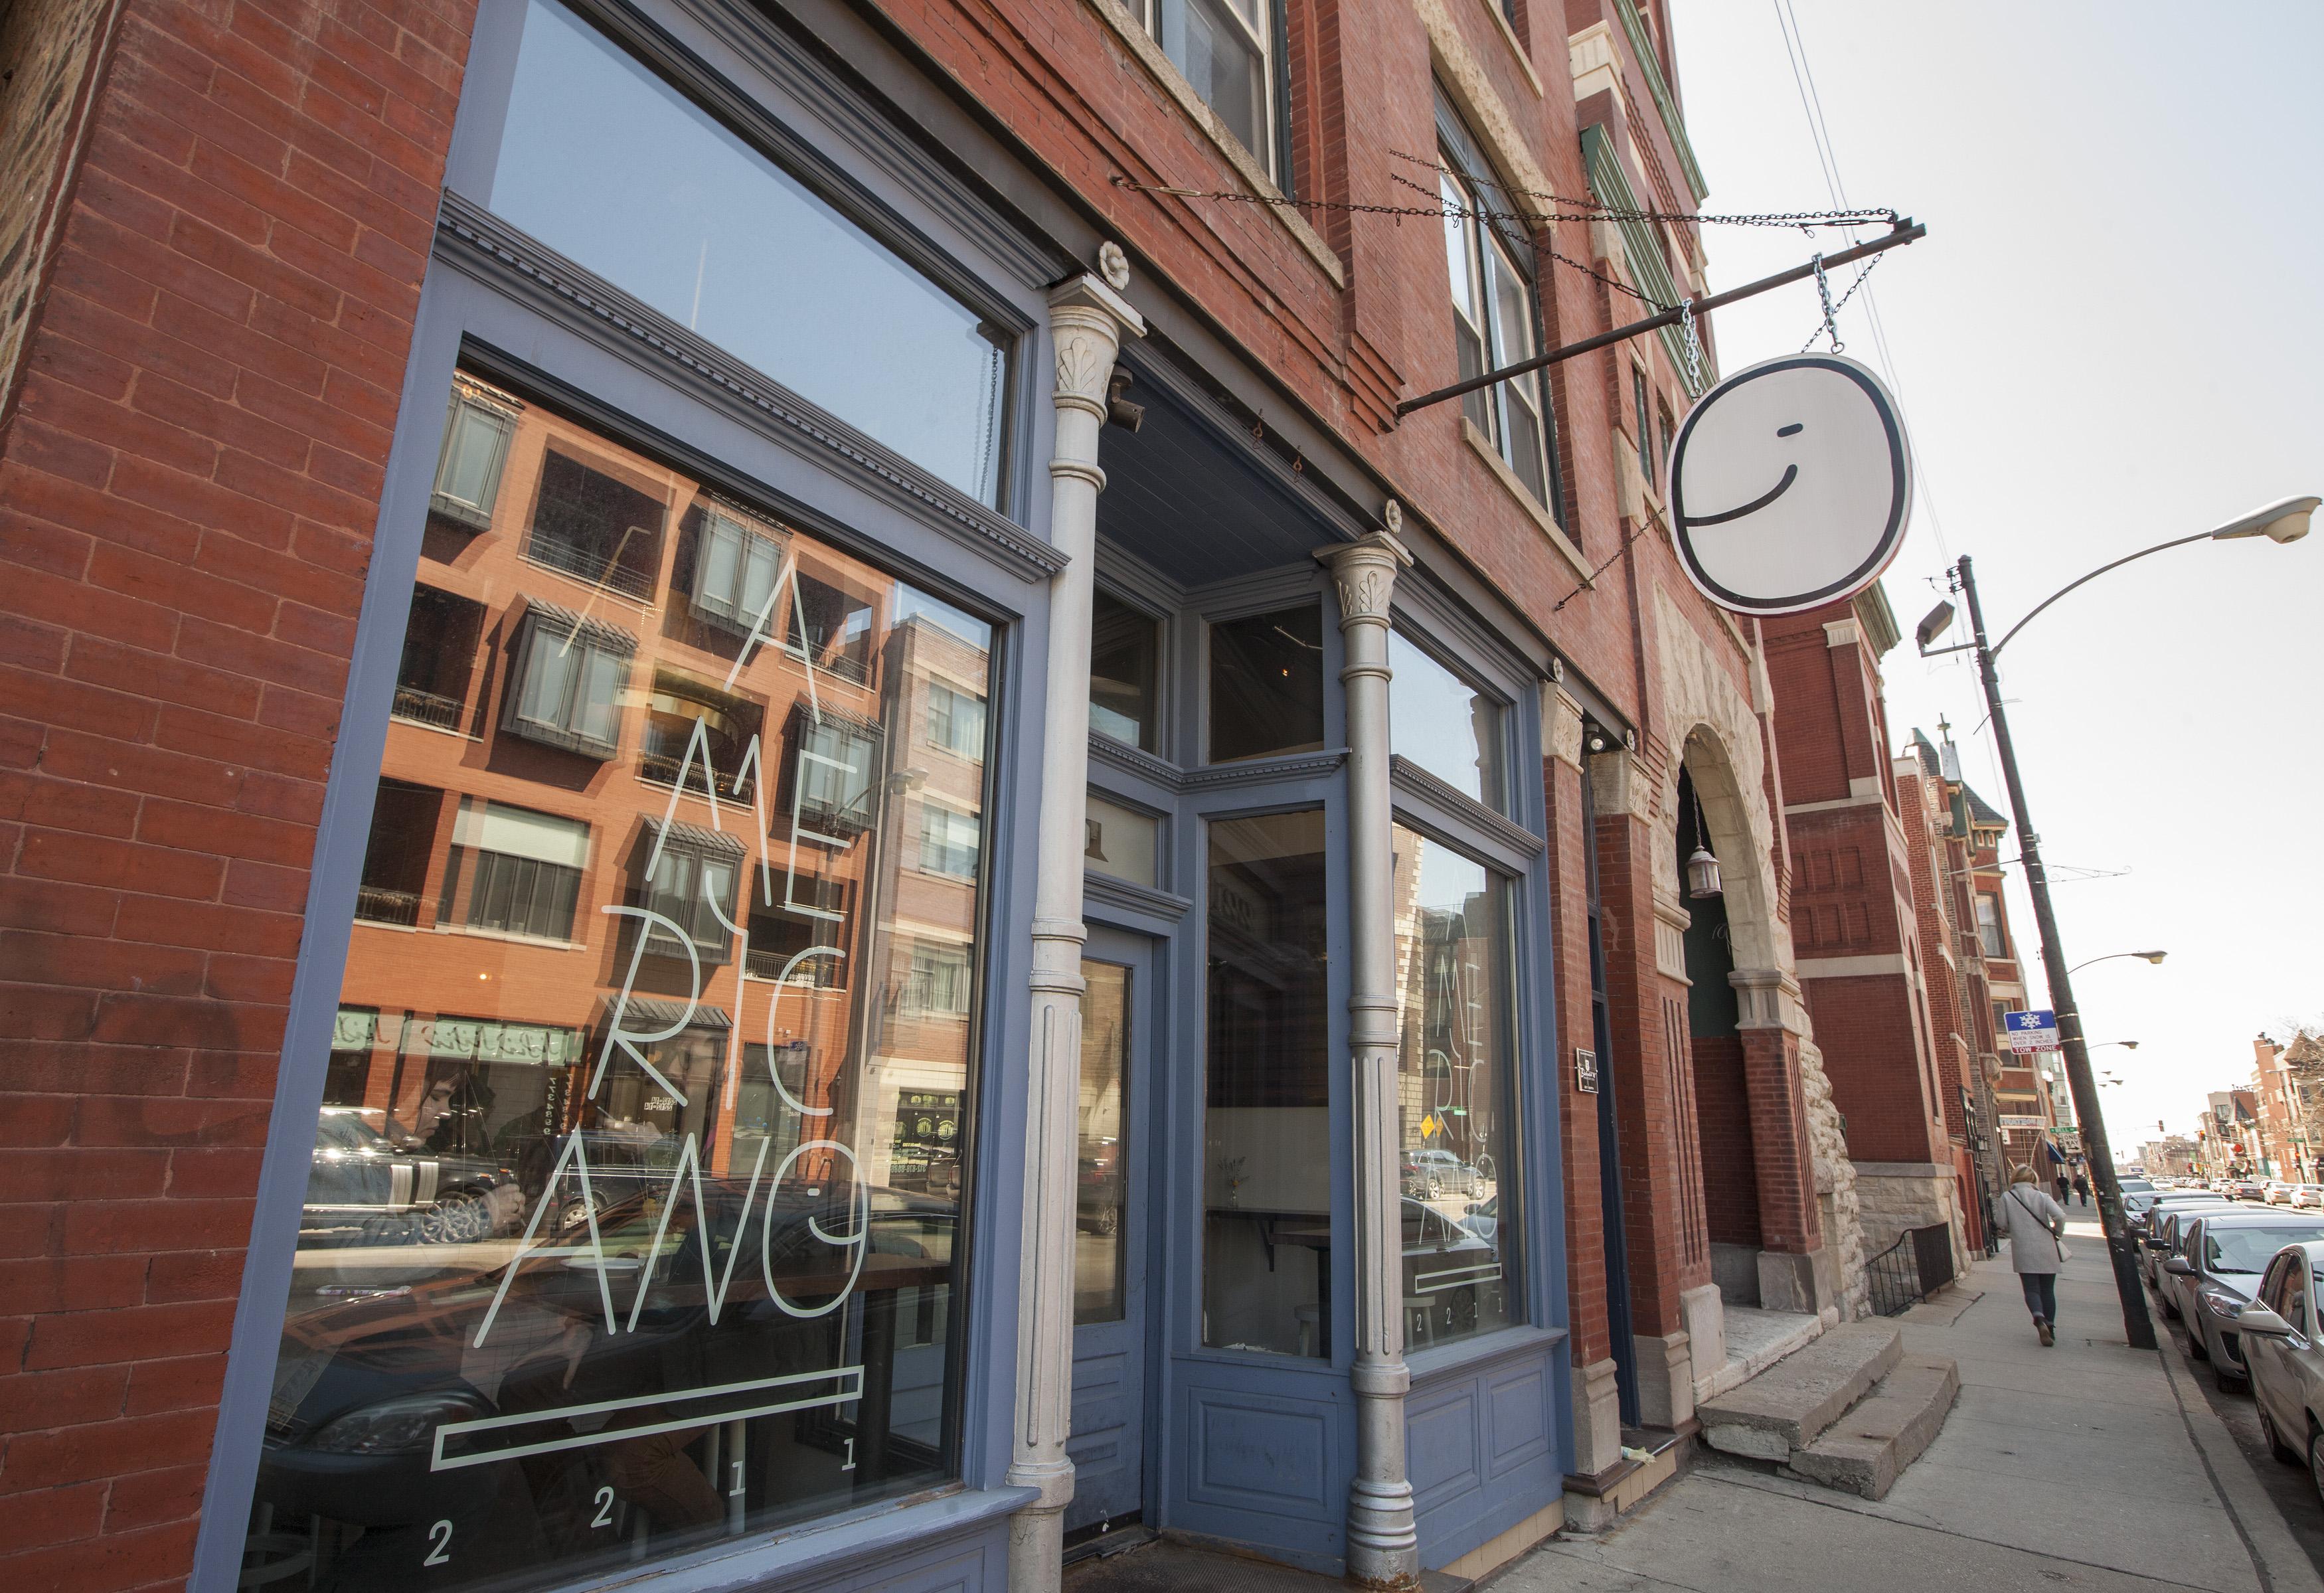 Americano 2211 Opens in Former Birchwood Kitchen Space